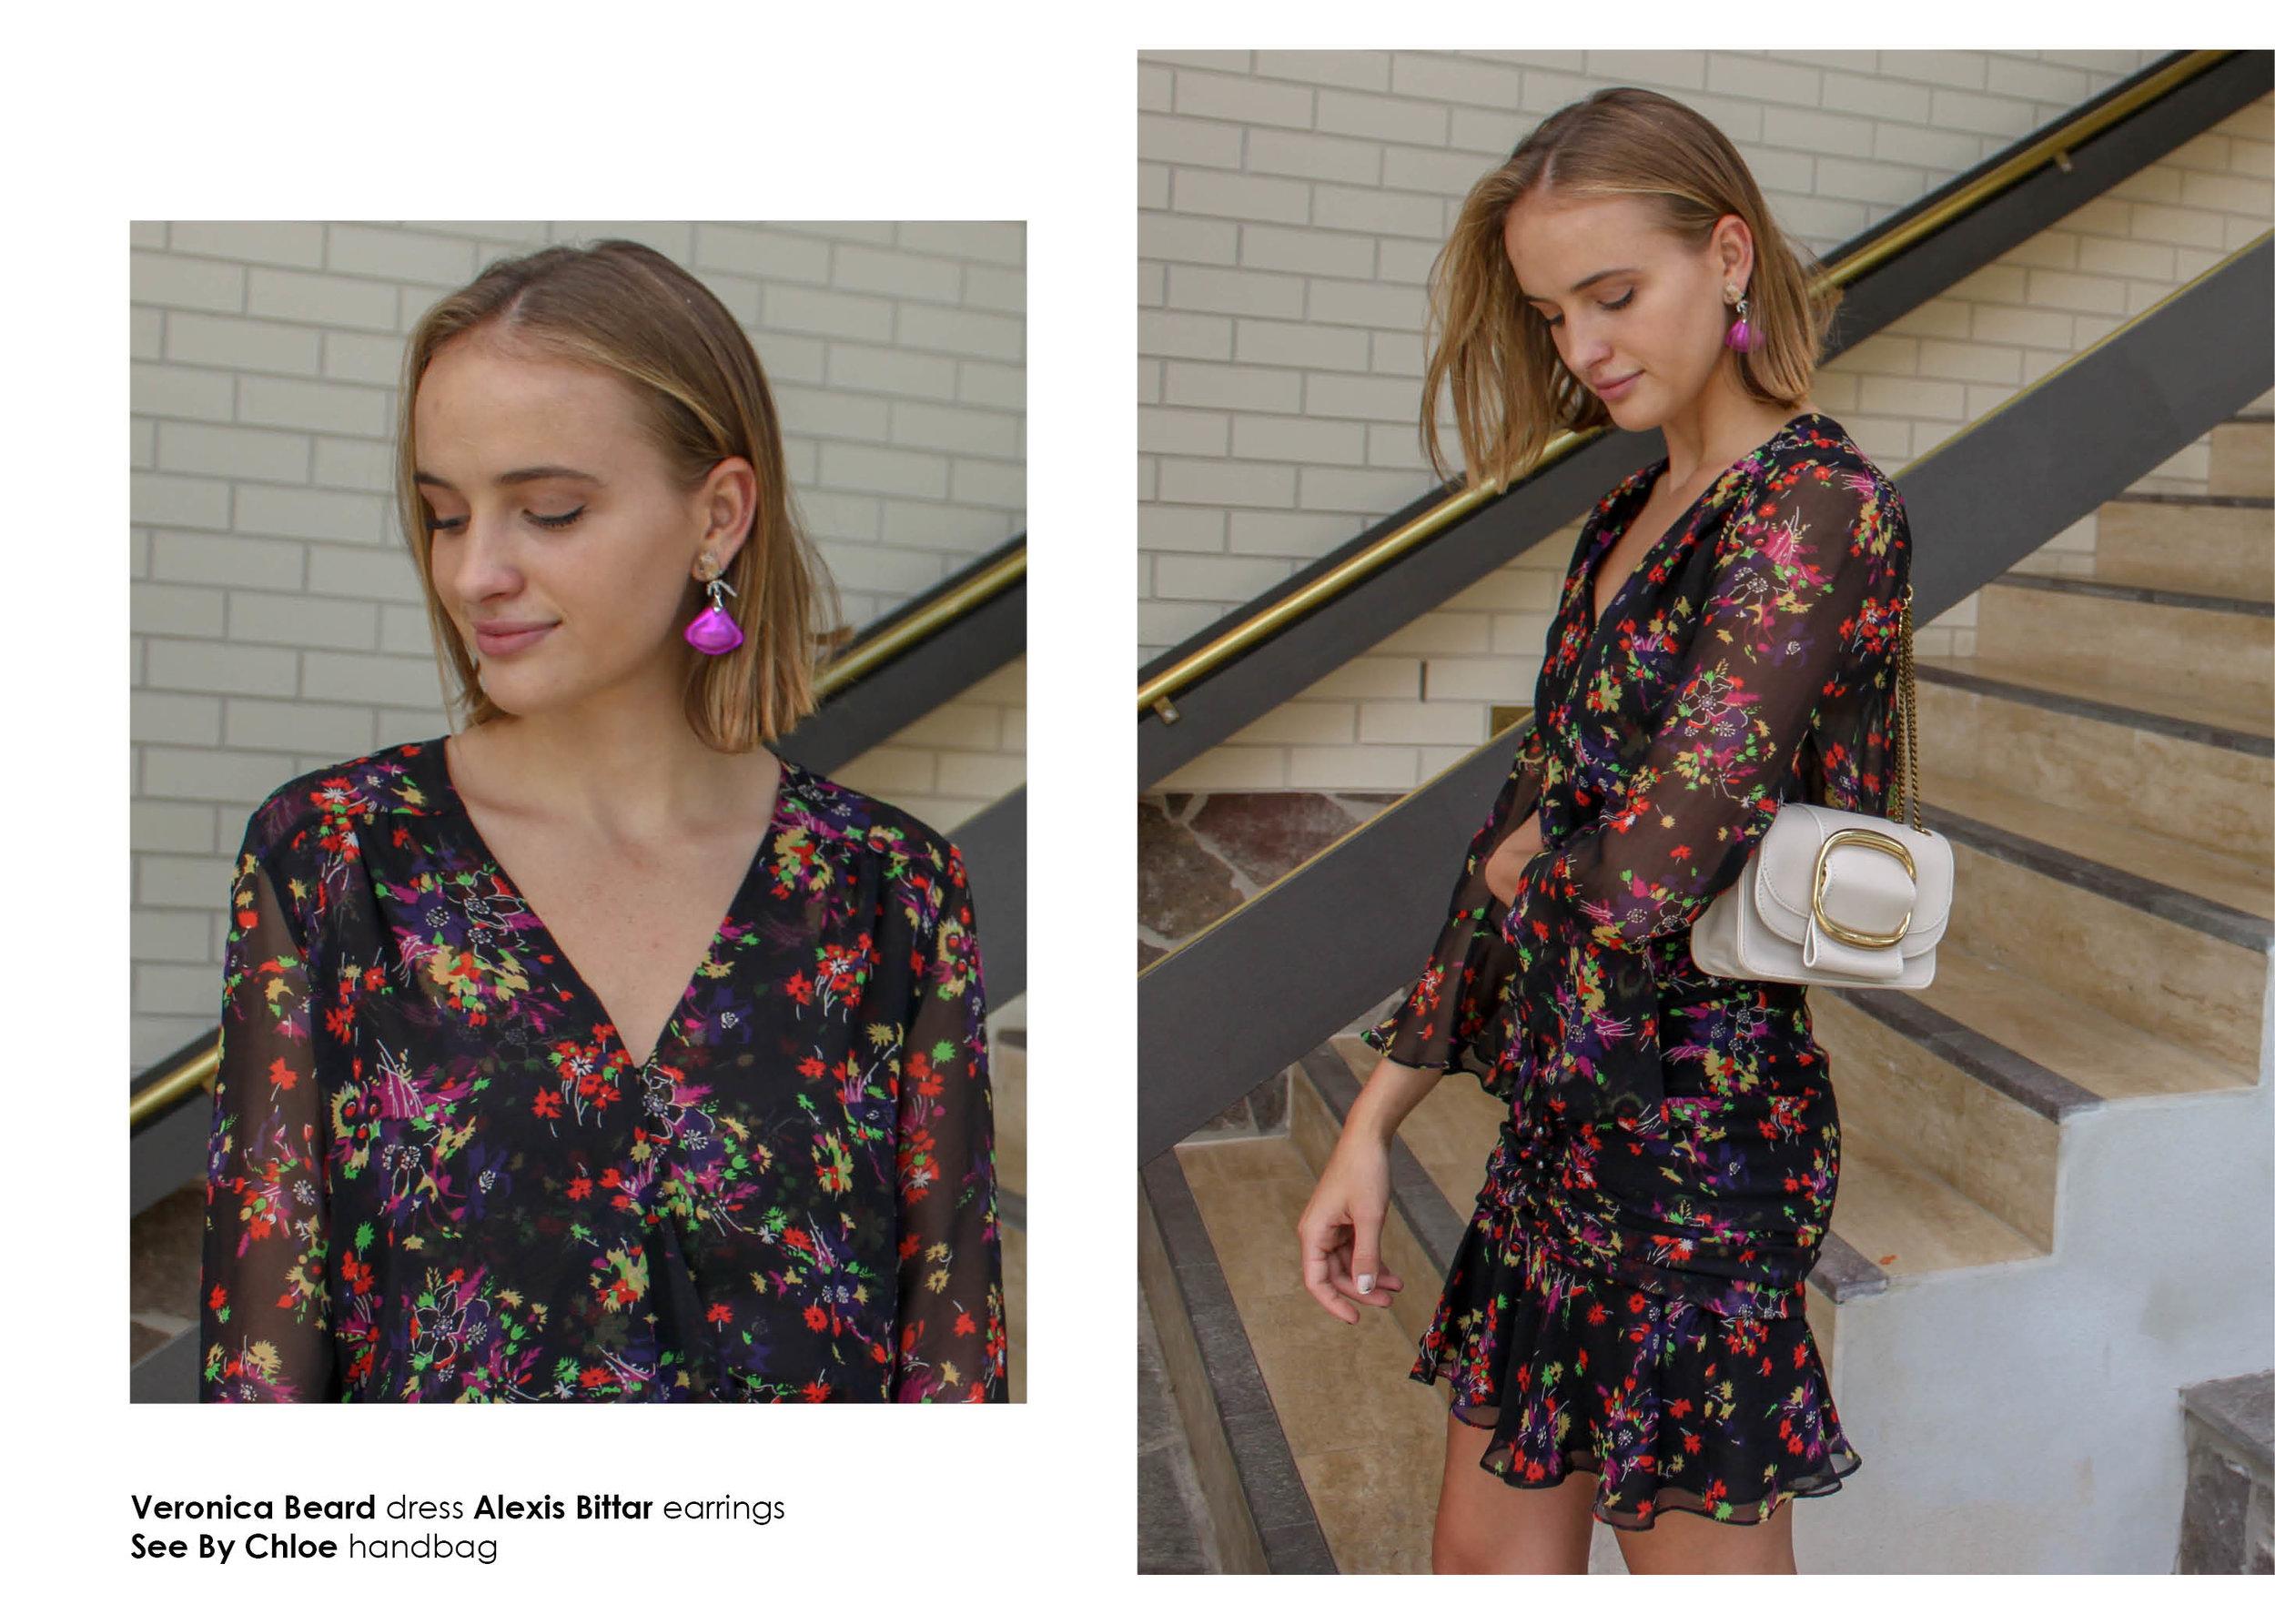 VeronicaBear-April19-newsletter-layout-7.jpg